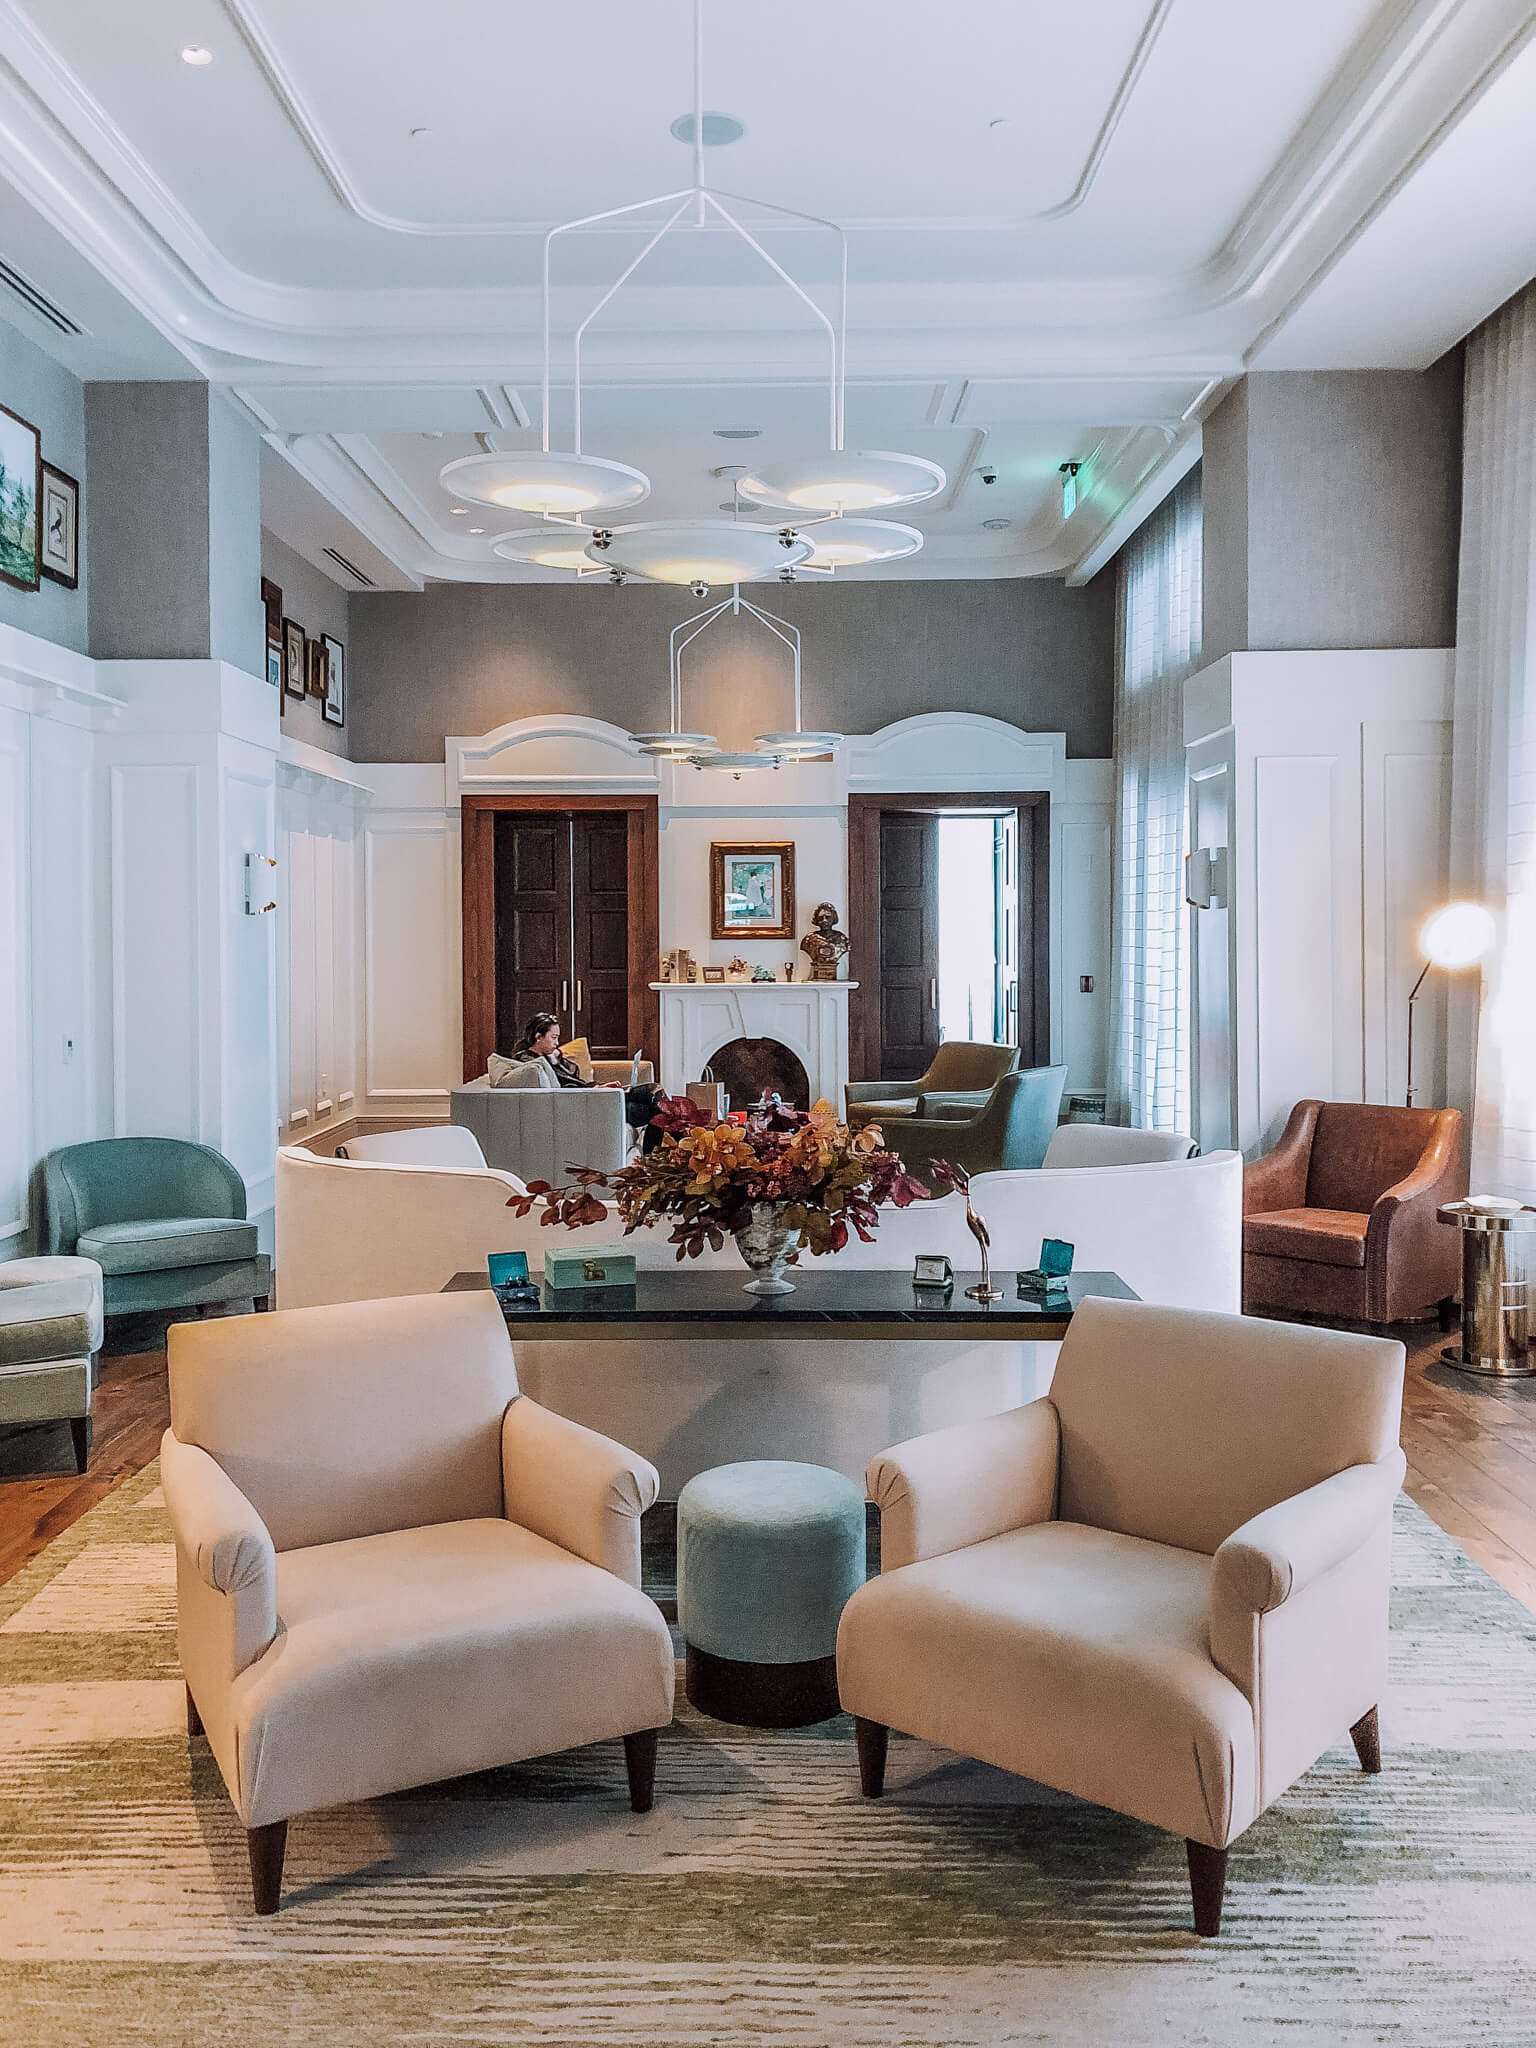 Perry Lane's lobby